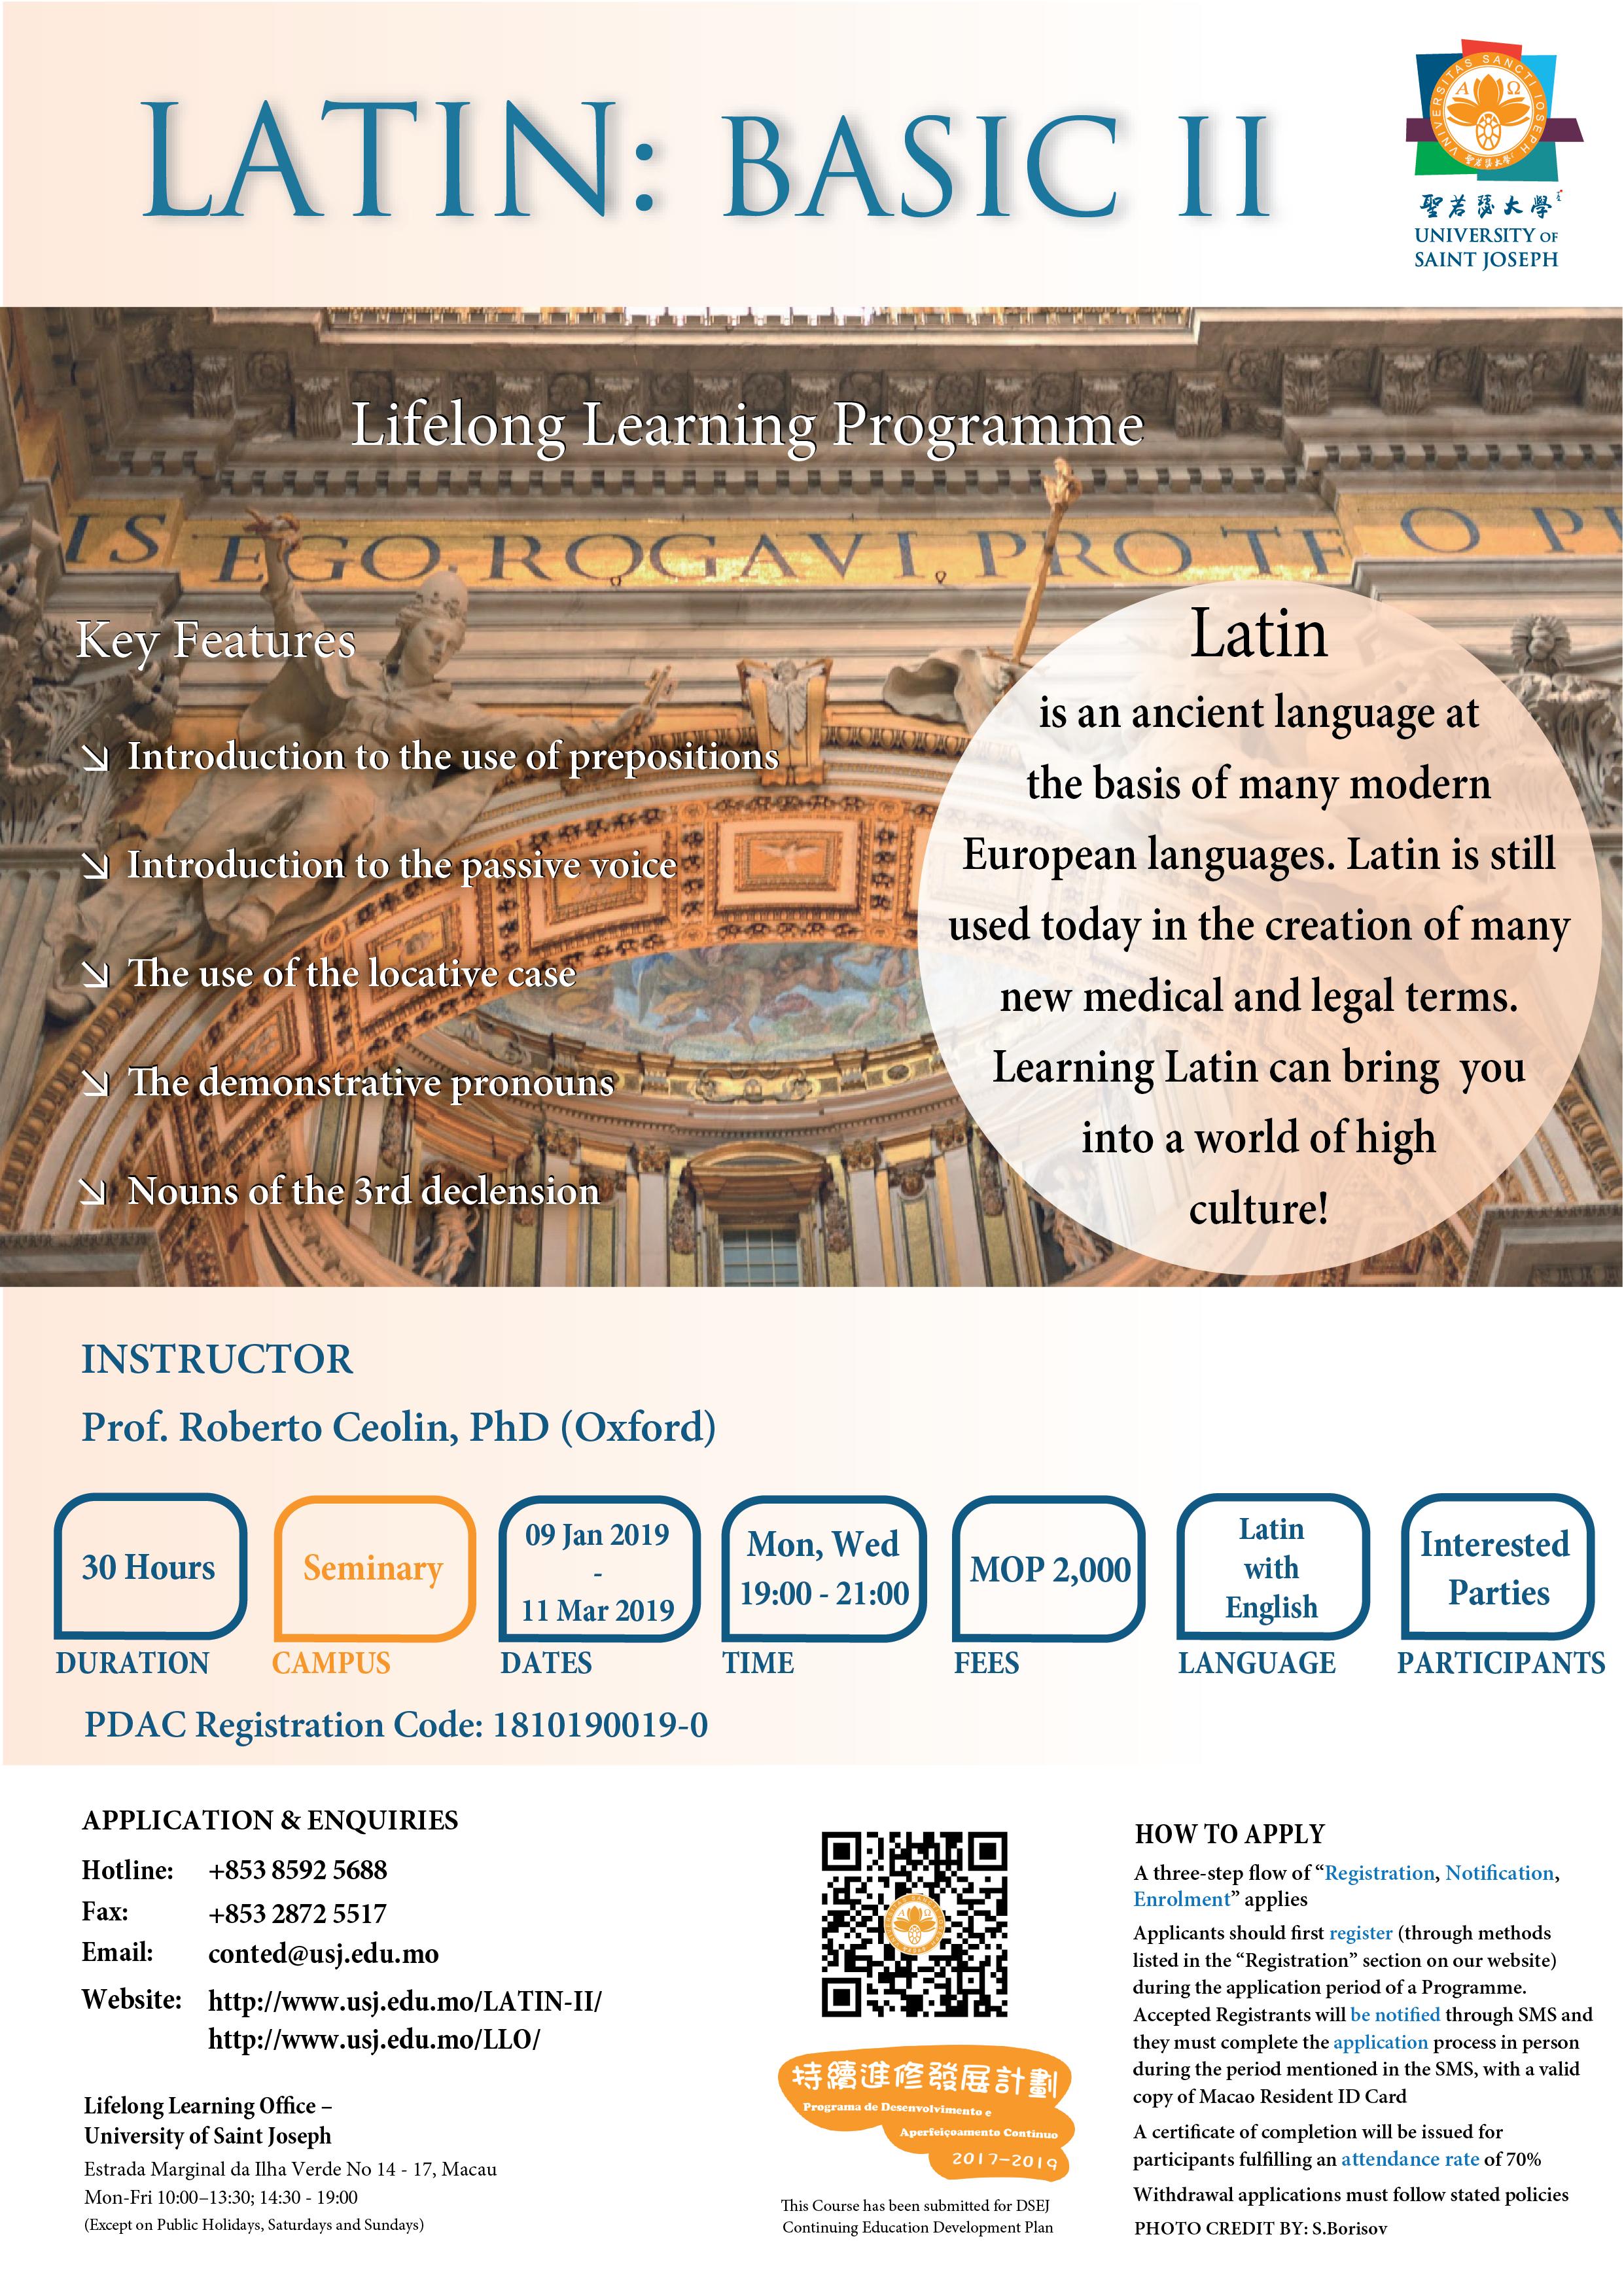 Latin 2-4 v6.3 (1)_Latin 2 - Poster